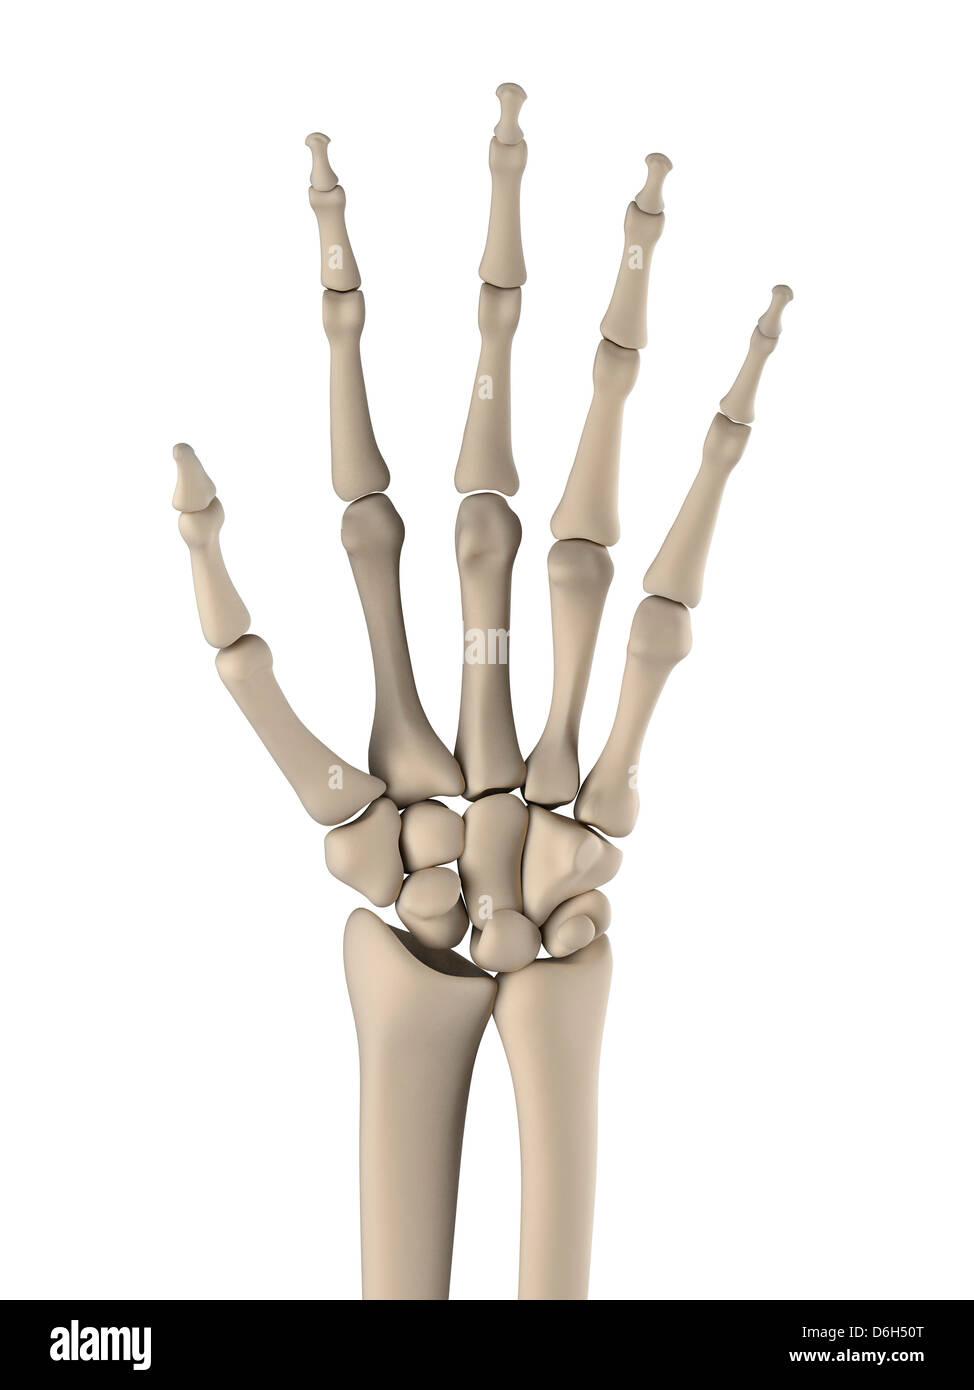 Hand Bones Artwork Stock Photo 55696168 Alamy